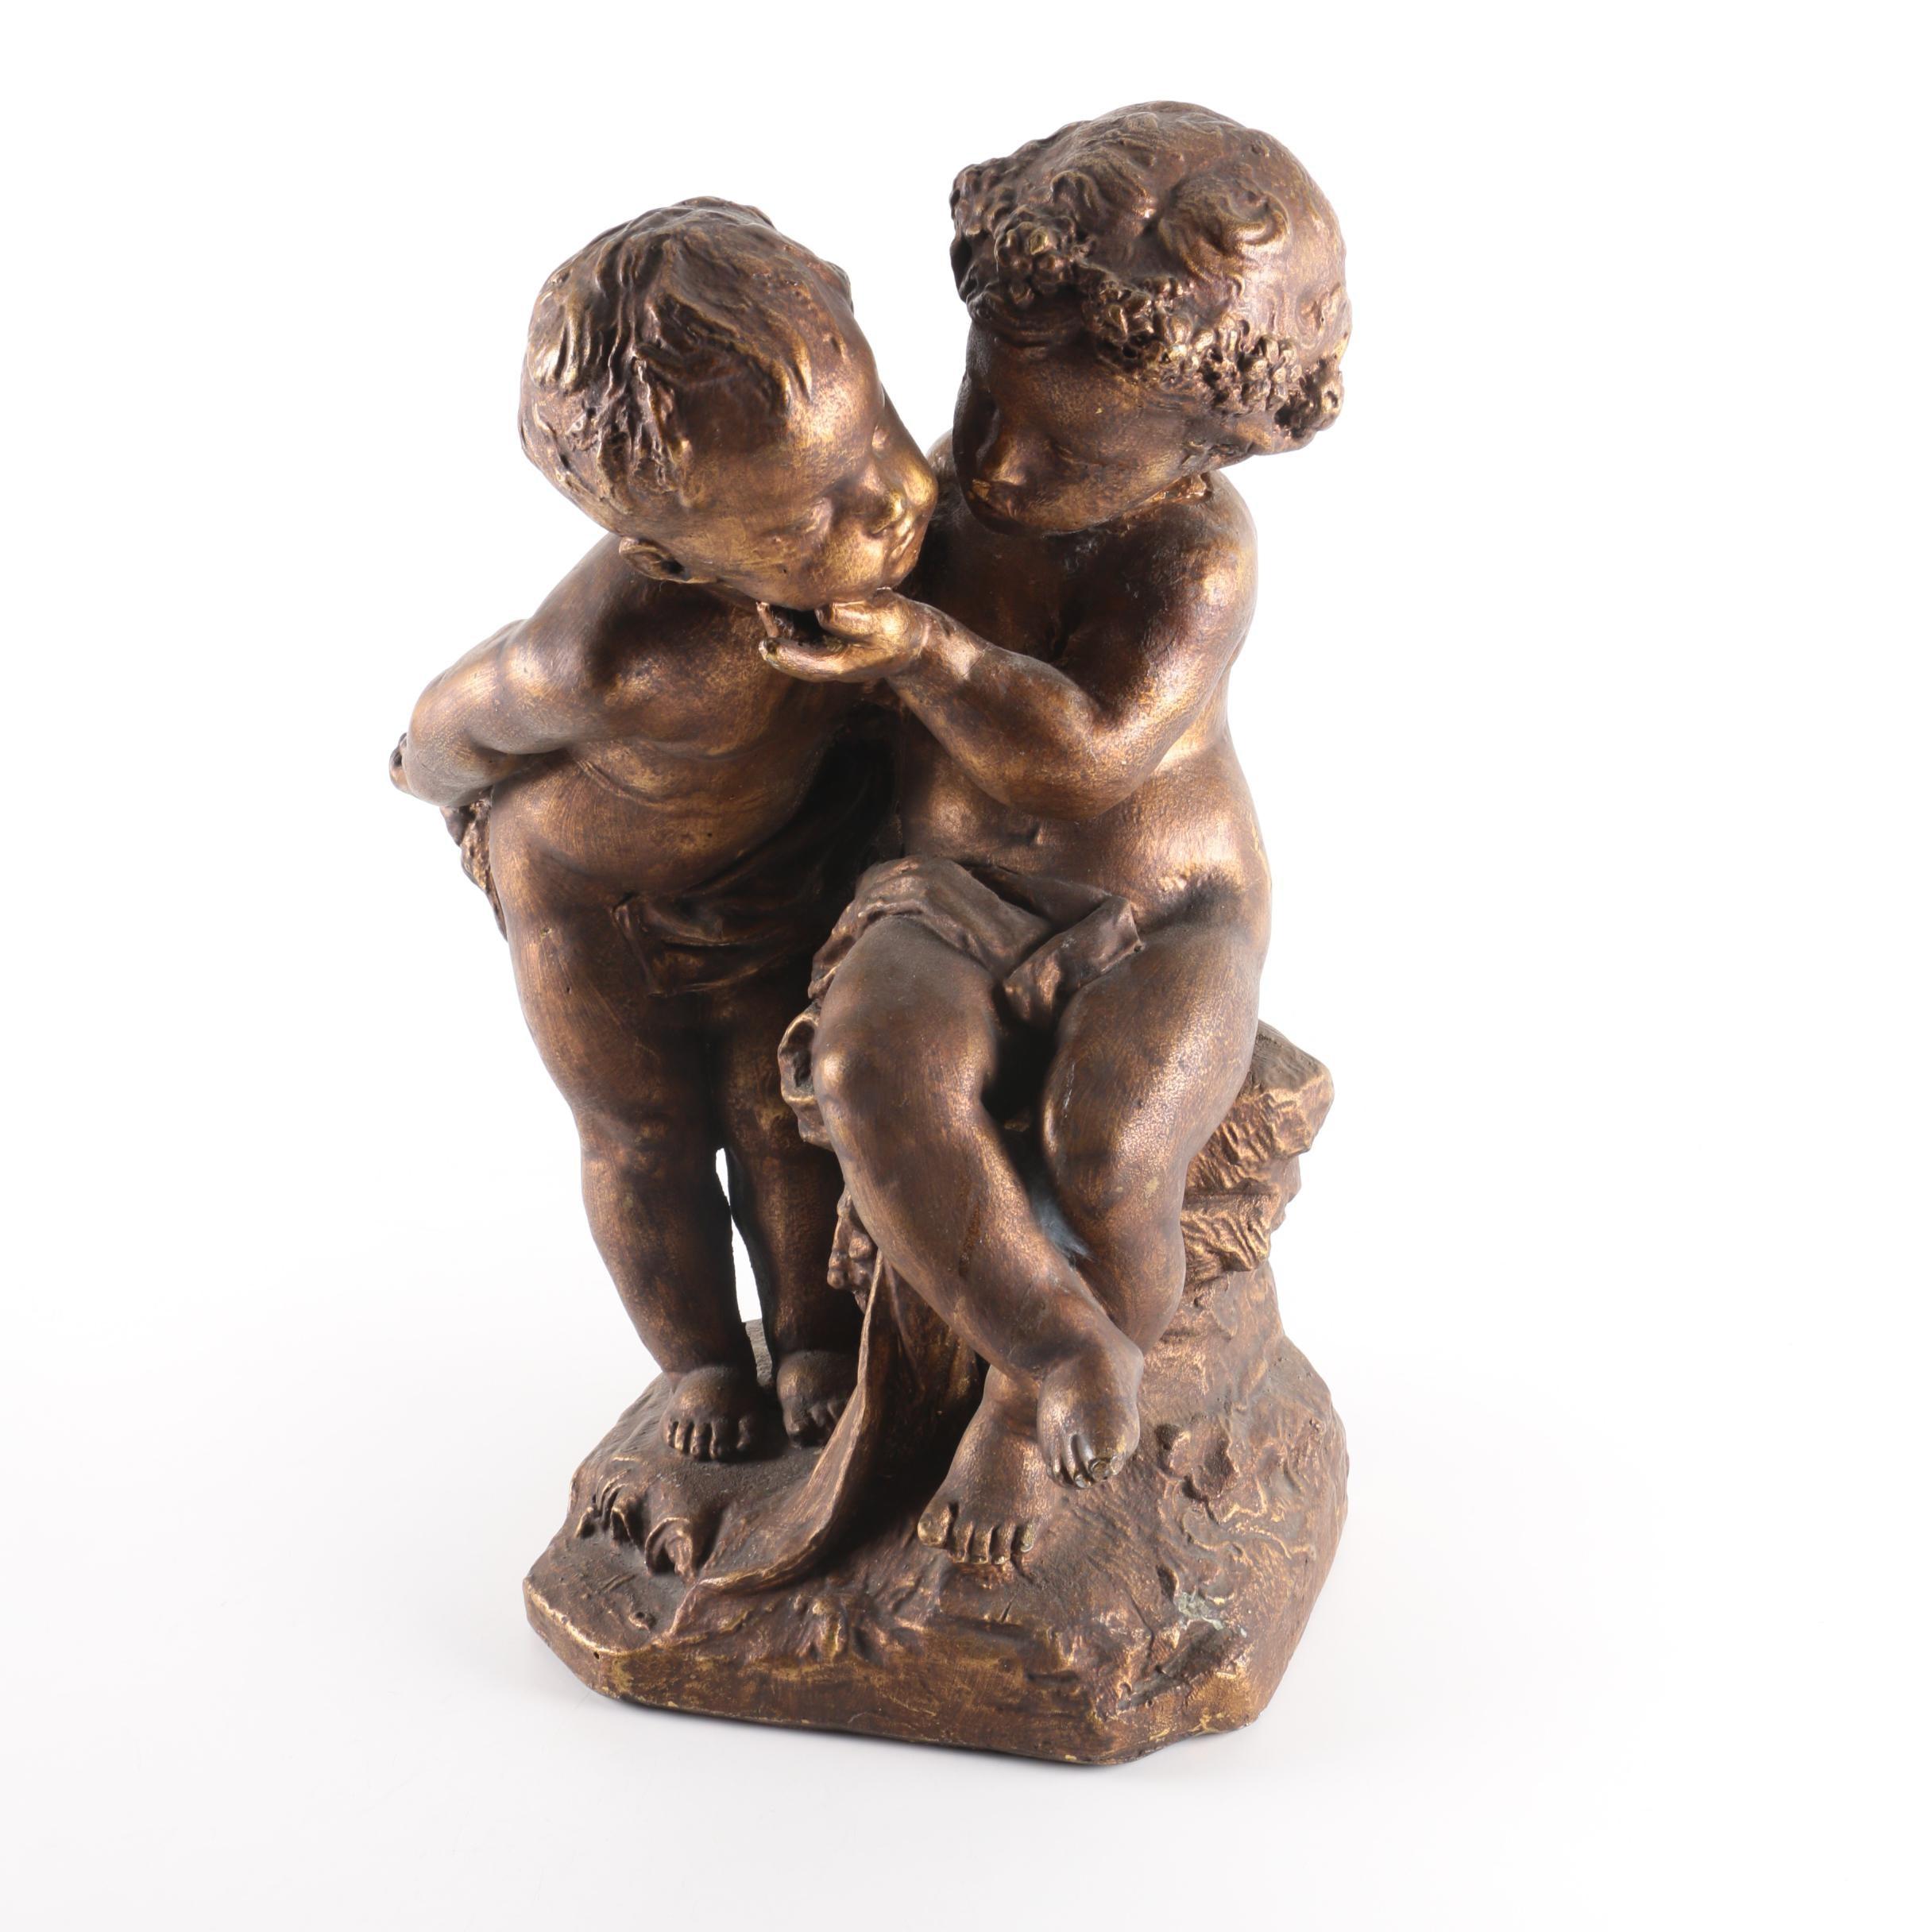 Mid Century Cherub Statue in Bronze Toned Finish